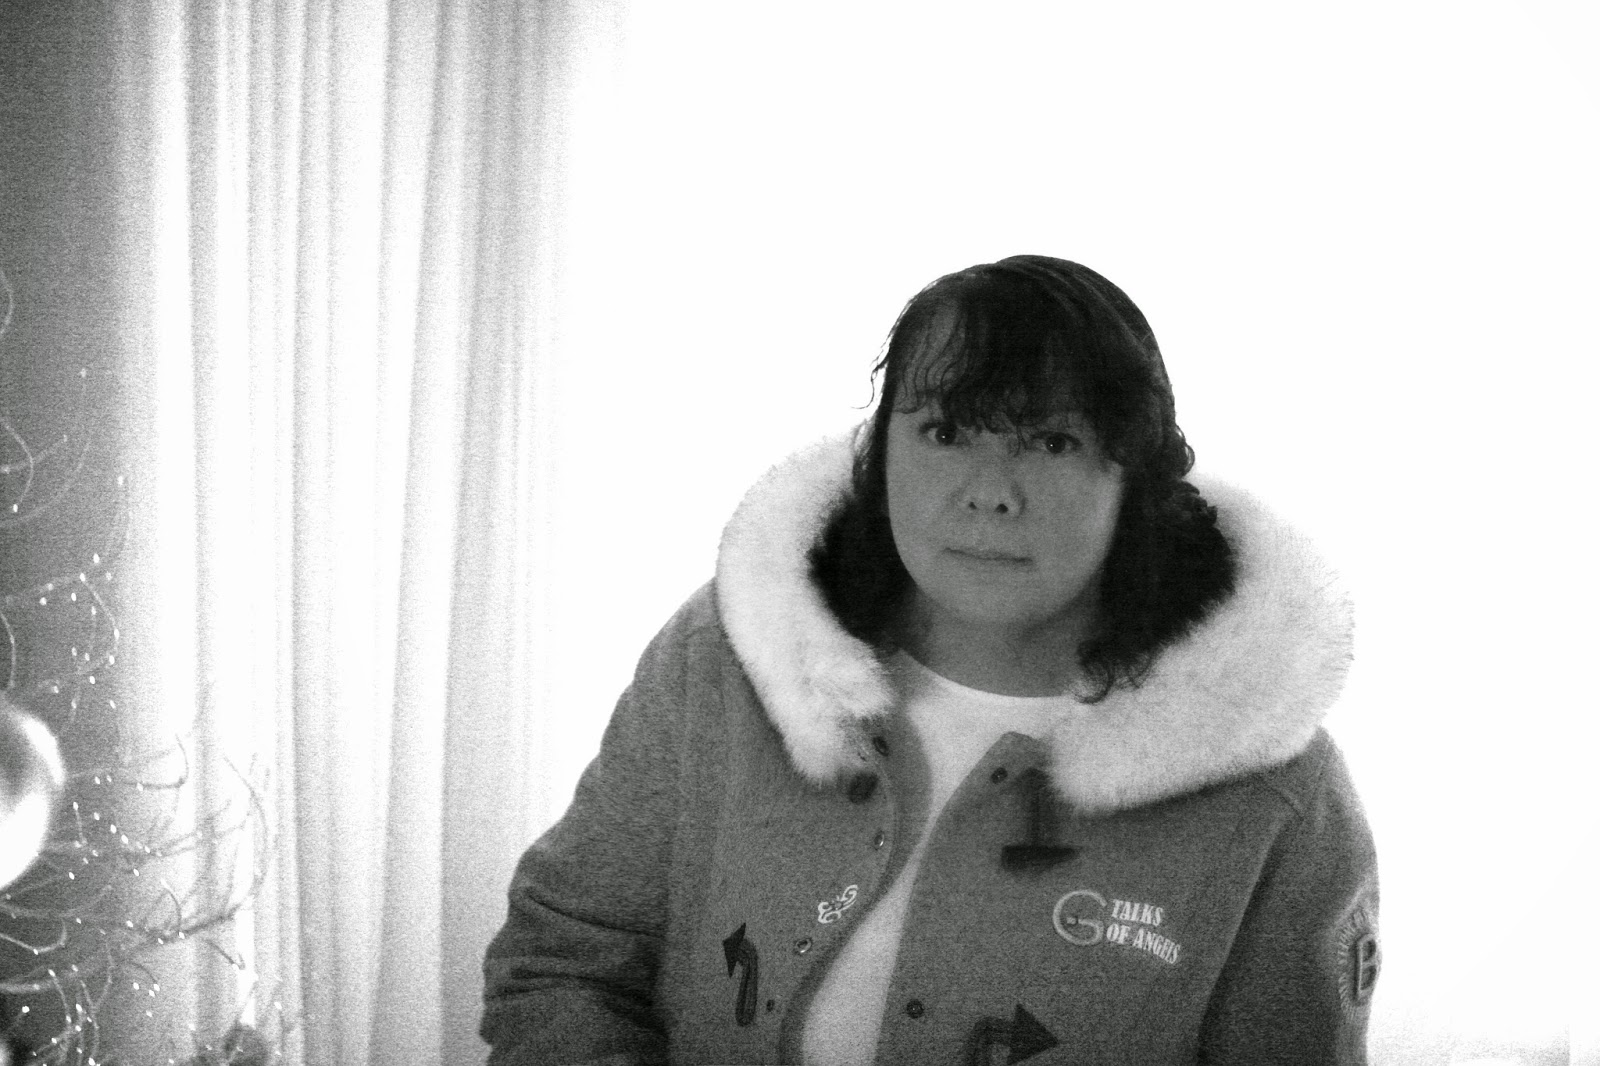 208 Talks of angels - Vilena Snow